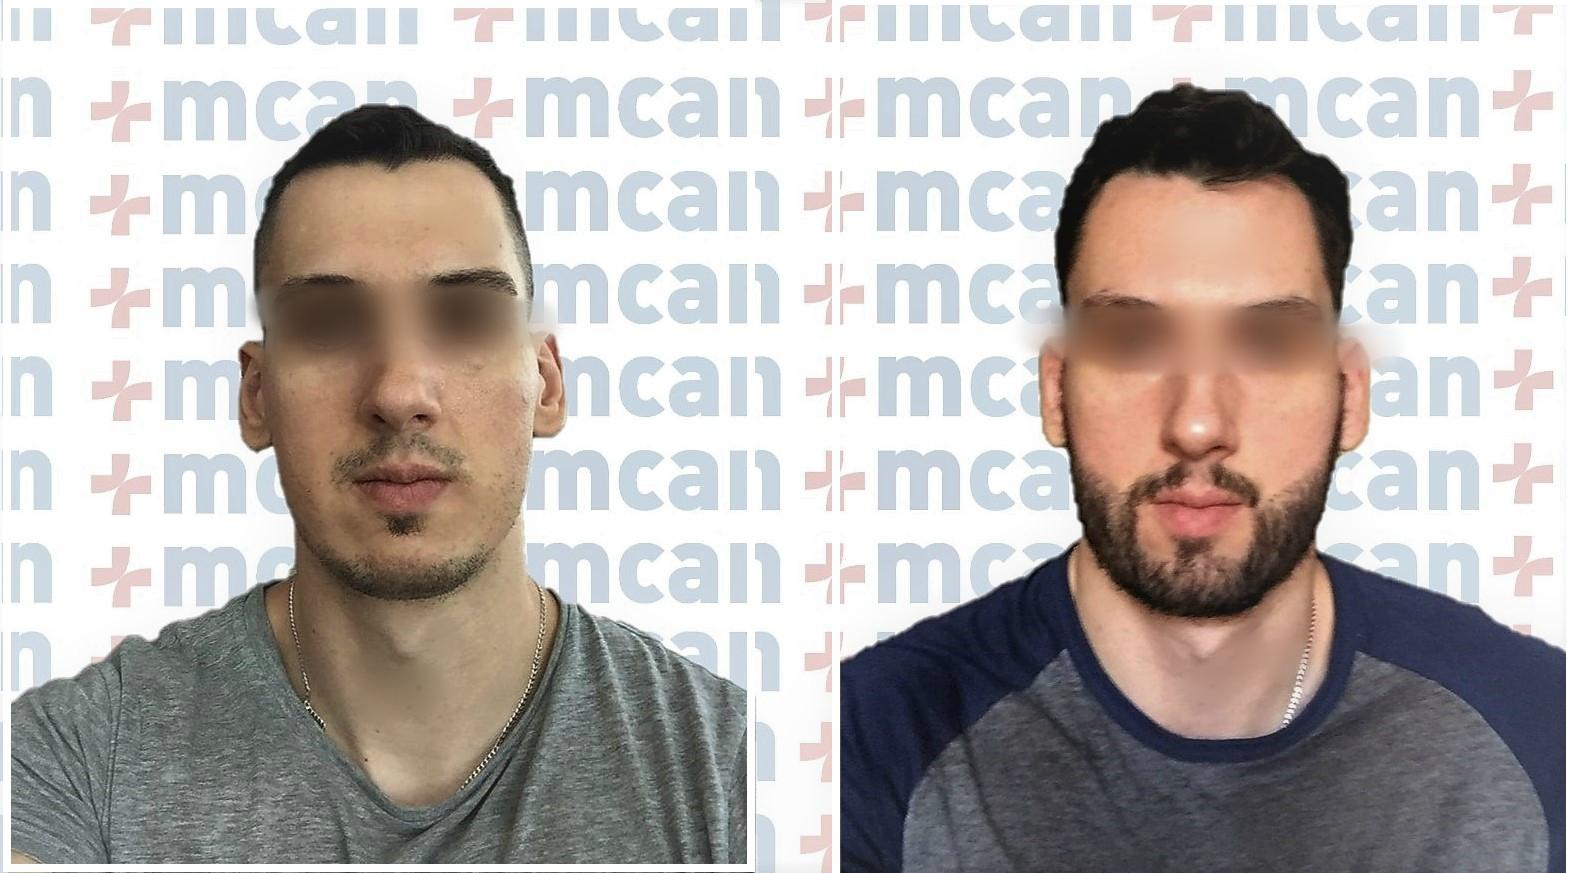 beard transplant before after.jpg